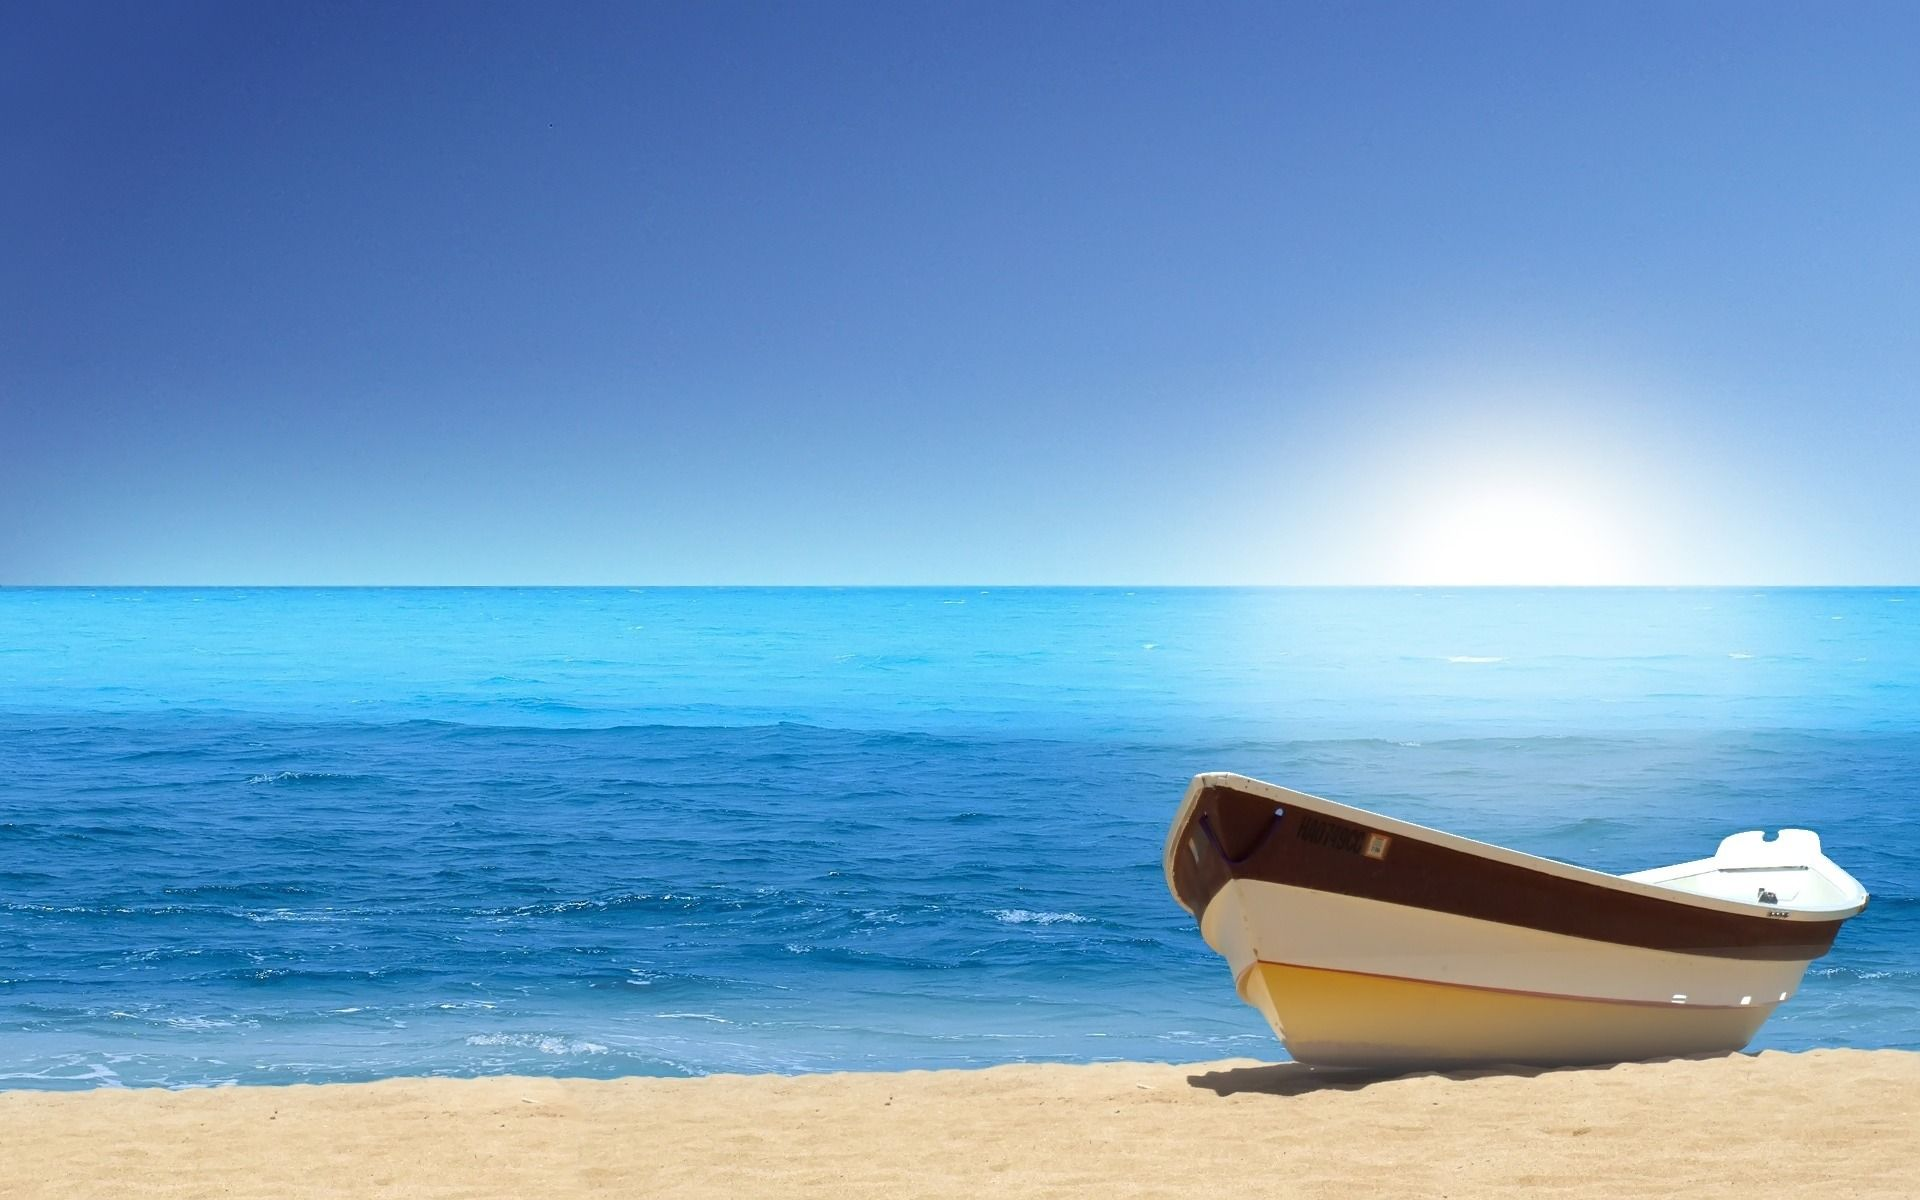 Beach Tropical Sky Sea Boat 4k Wallpaper Hdwallpaper Desktop Wallpaper Beach Sky Sea